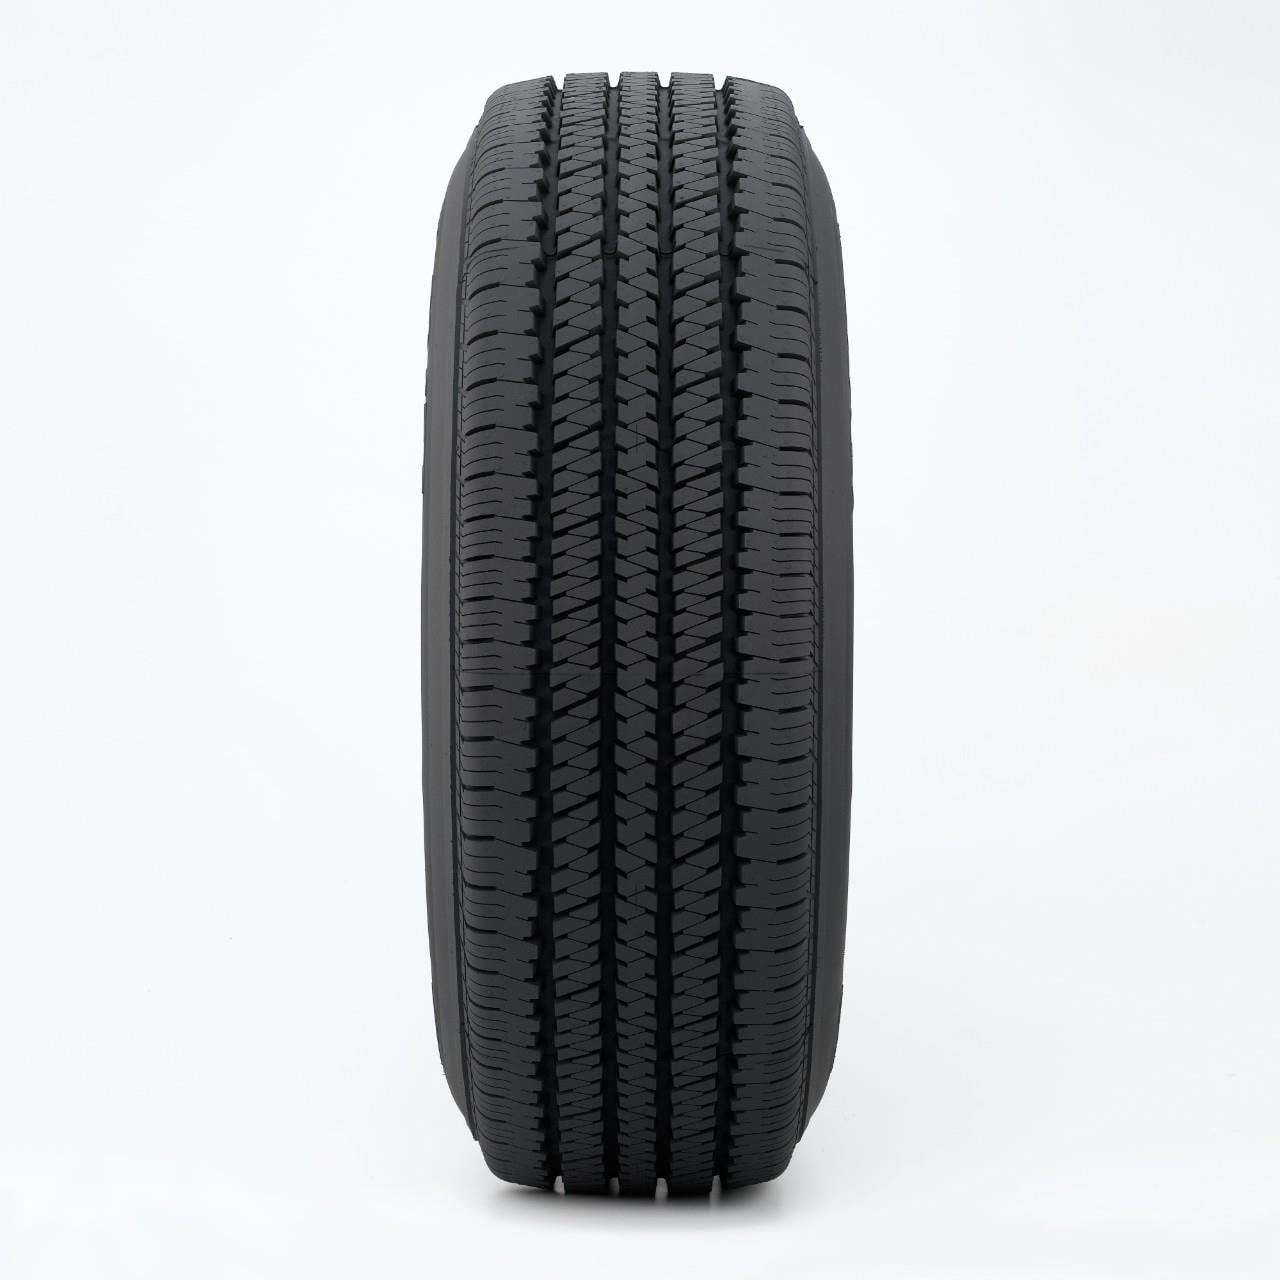 Bridgestone Dueler H/T 684 II 255/70R17 110 S Tire - Walmart com